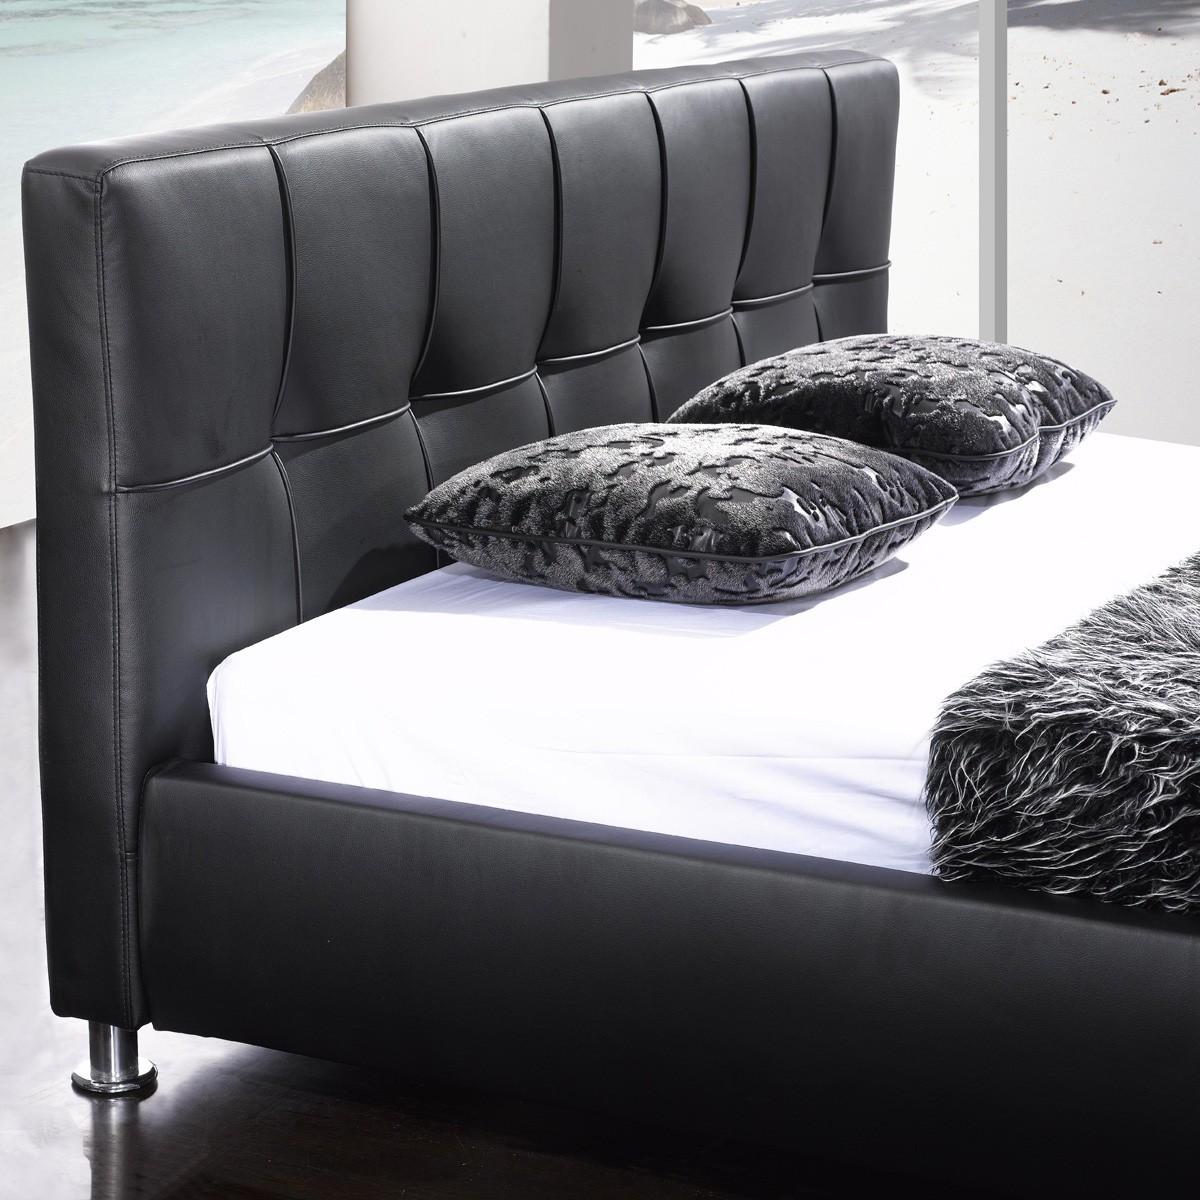 polsterbett zahrah 140 x 200 cm kunstleder schwarz. Black Bedroom Furniture Sets. Home Design Ideas